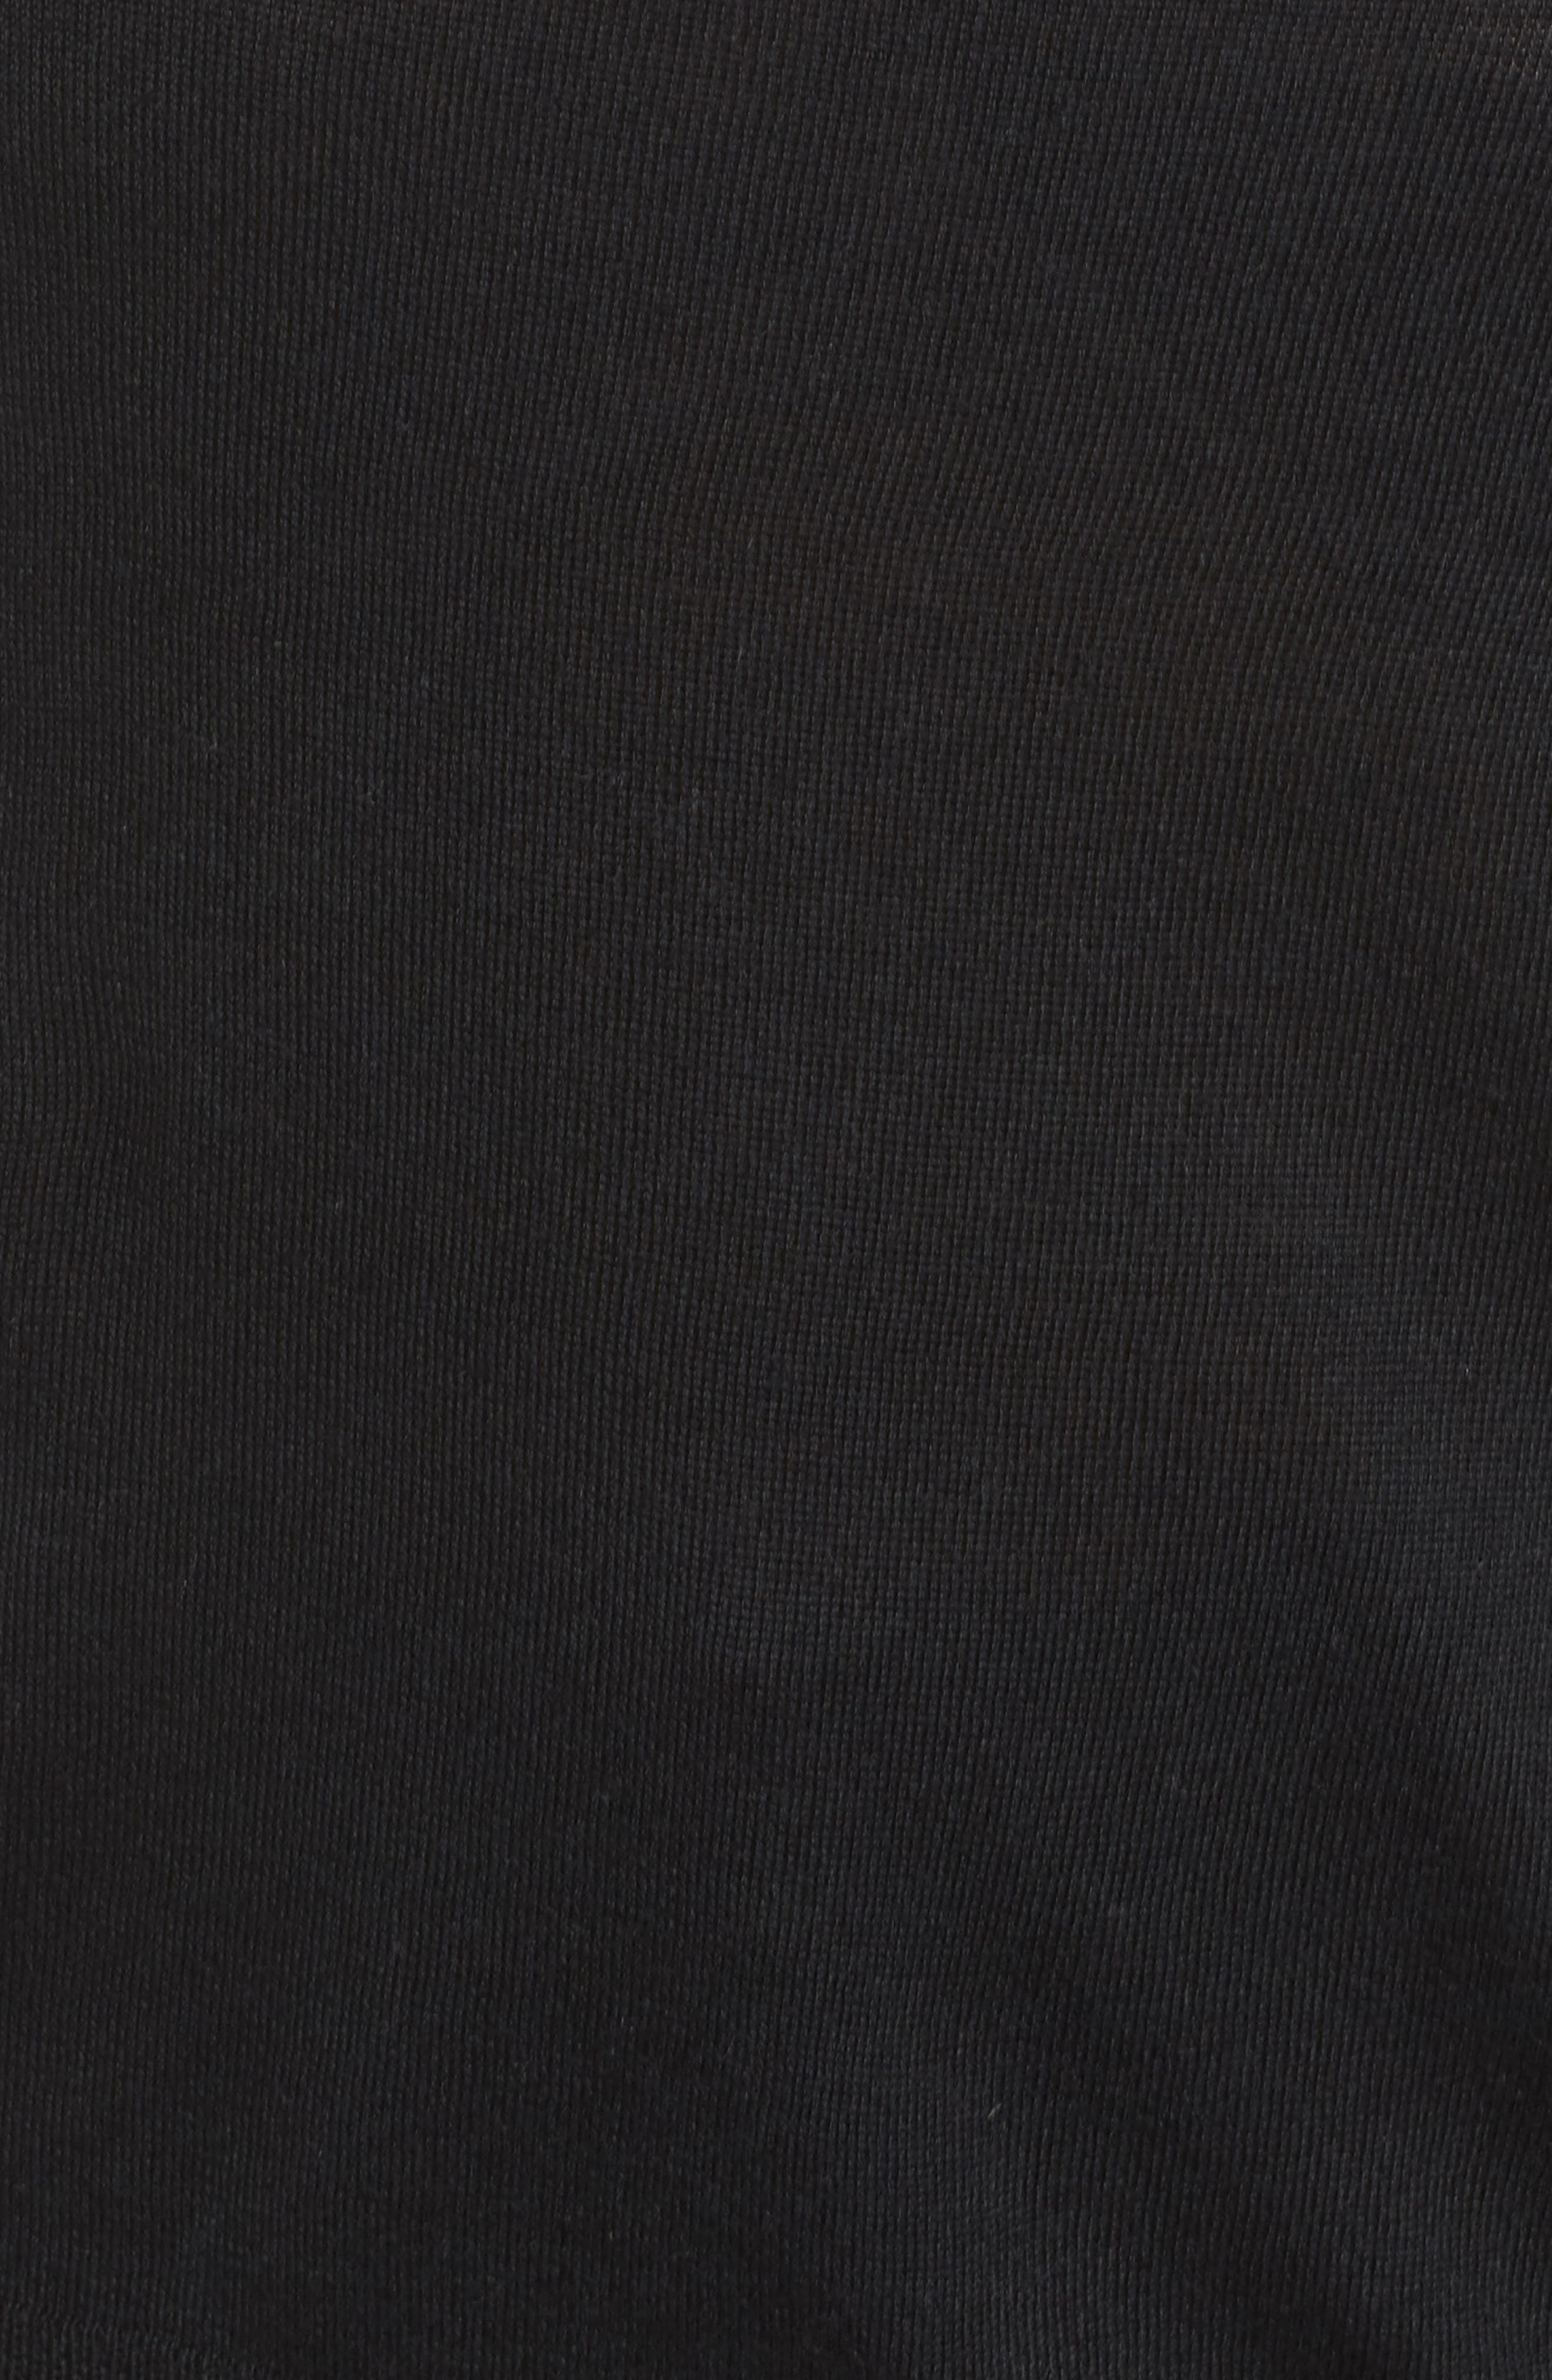 Merino Wool Blend Turtleneck Sweater,                             Alternate thumbnail 5, color,                             001